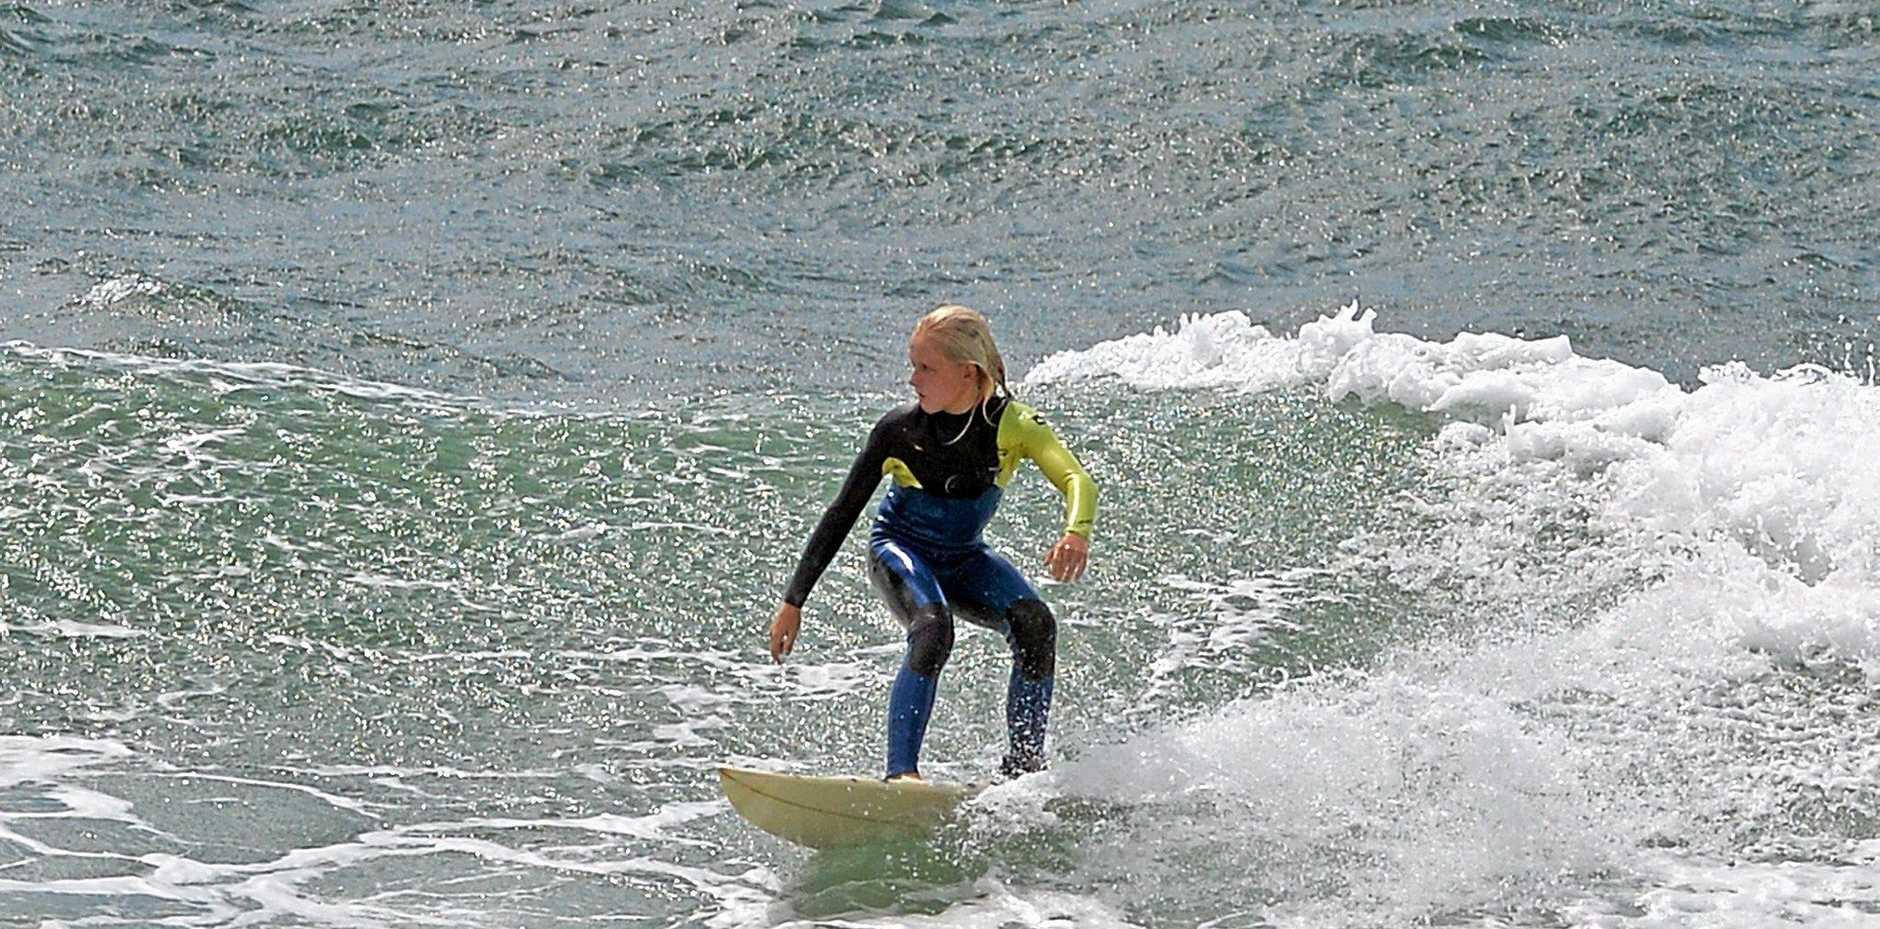 Wave of the day. Alexandra Headland.